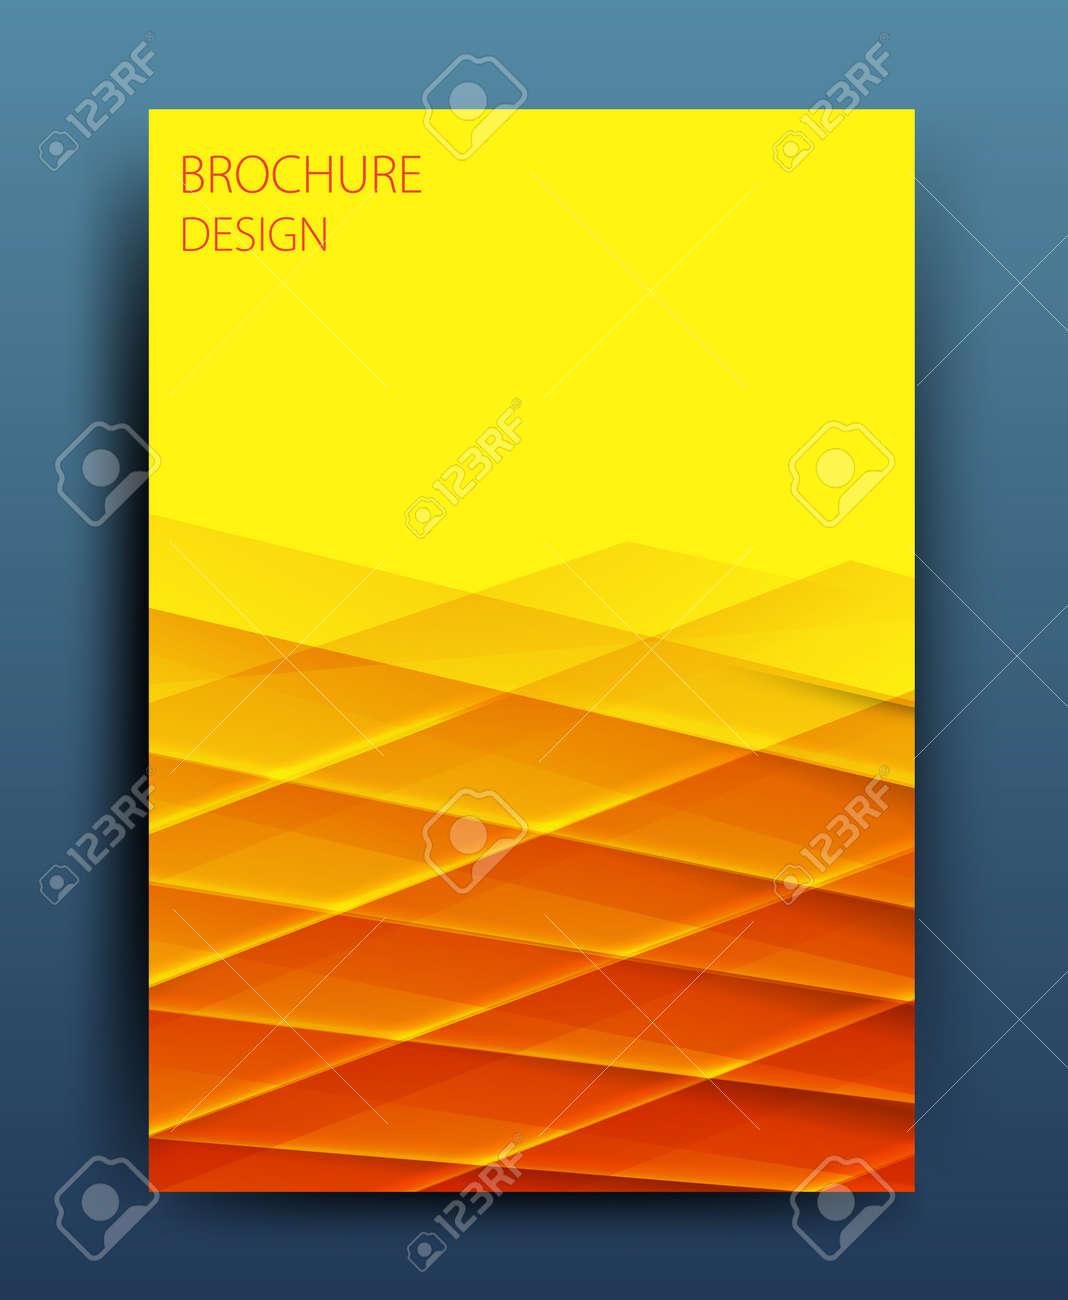 vector business brochure flyer template or corporate banner design